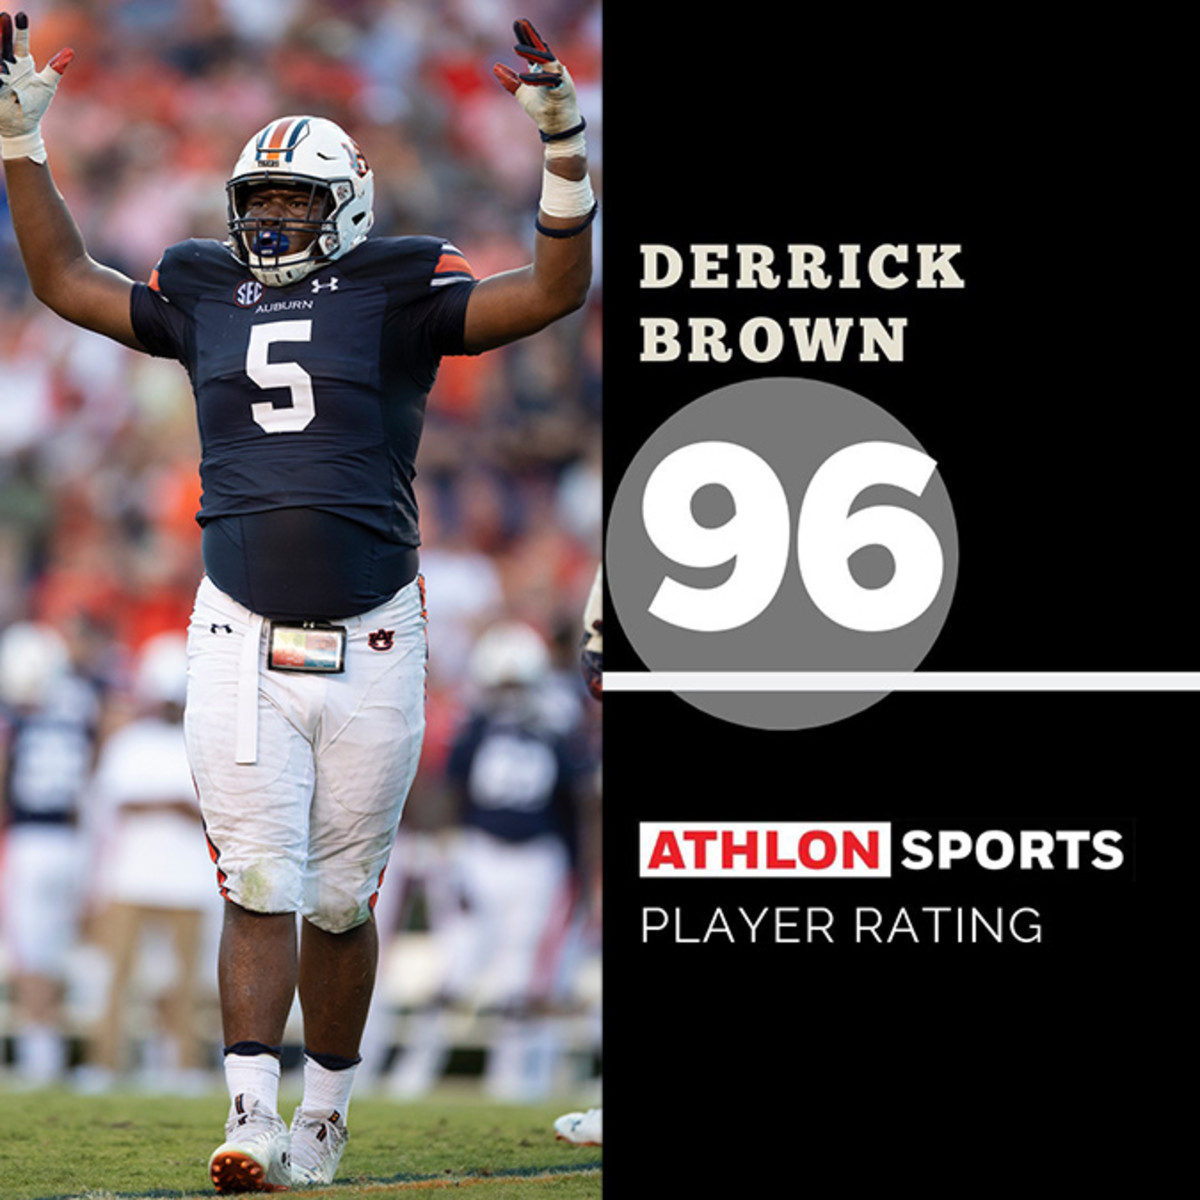 Derrick Brown, Auburn